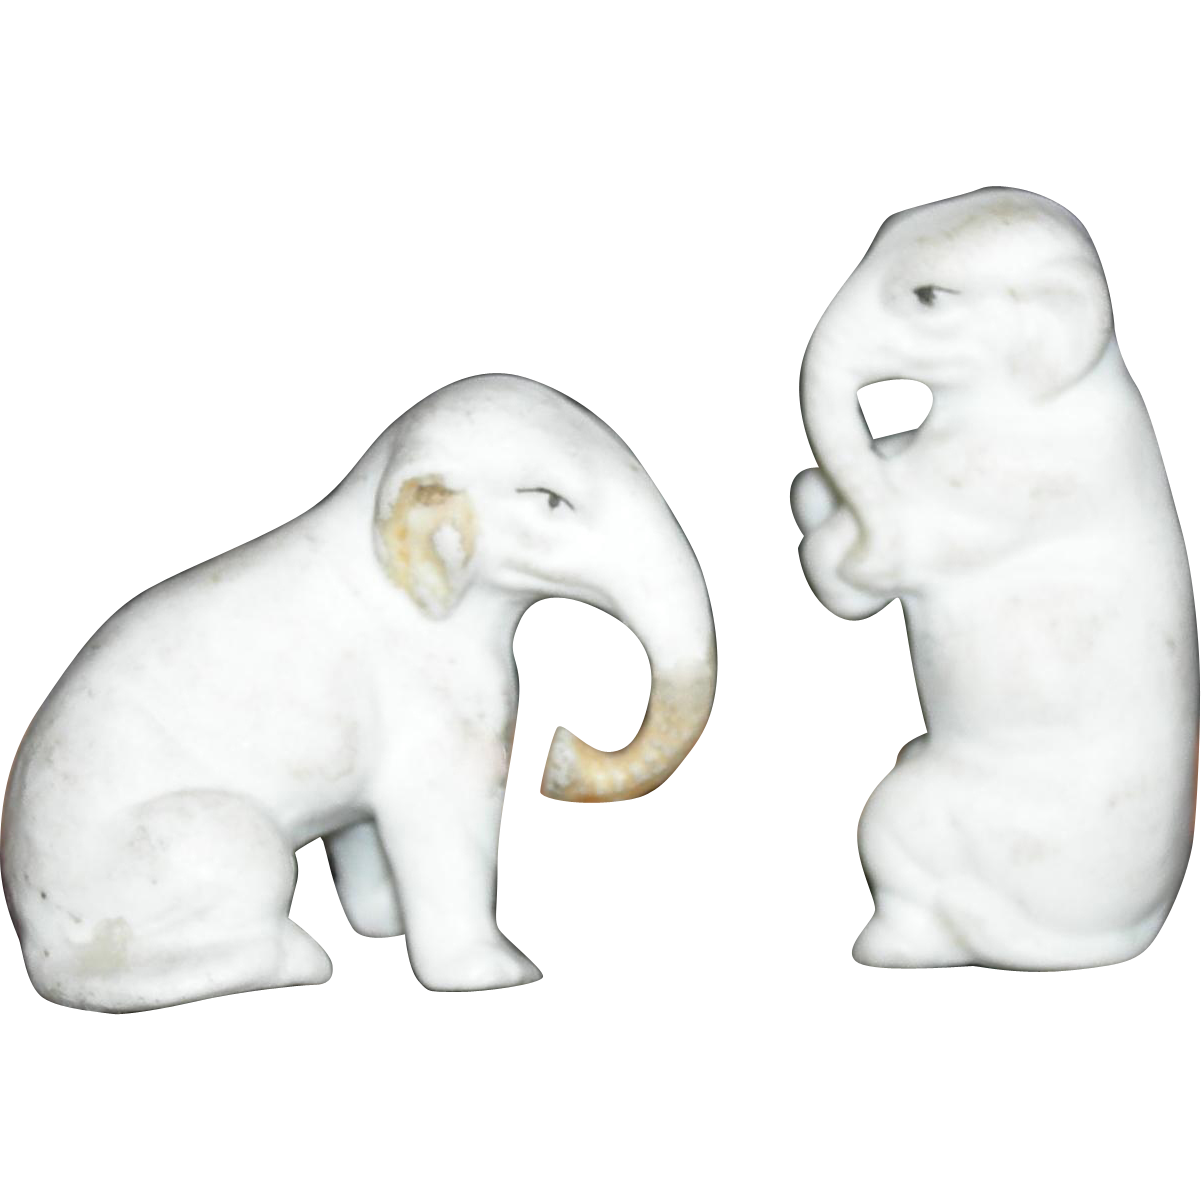 "Two (2) Tiny - ELEPHANTS - Bisque - 1 1/2"" & 1 1/4"" - Vintage!!!"